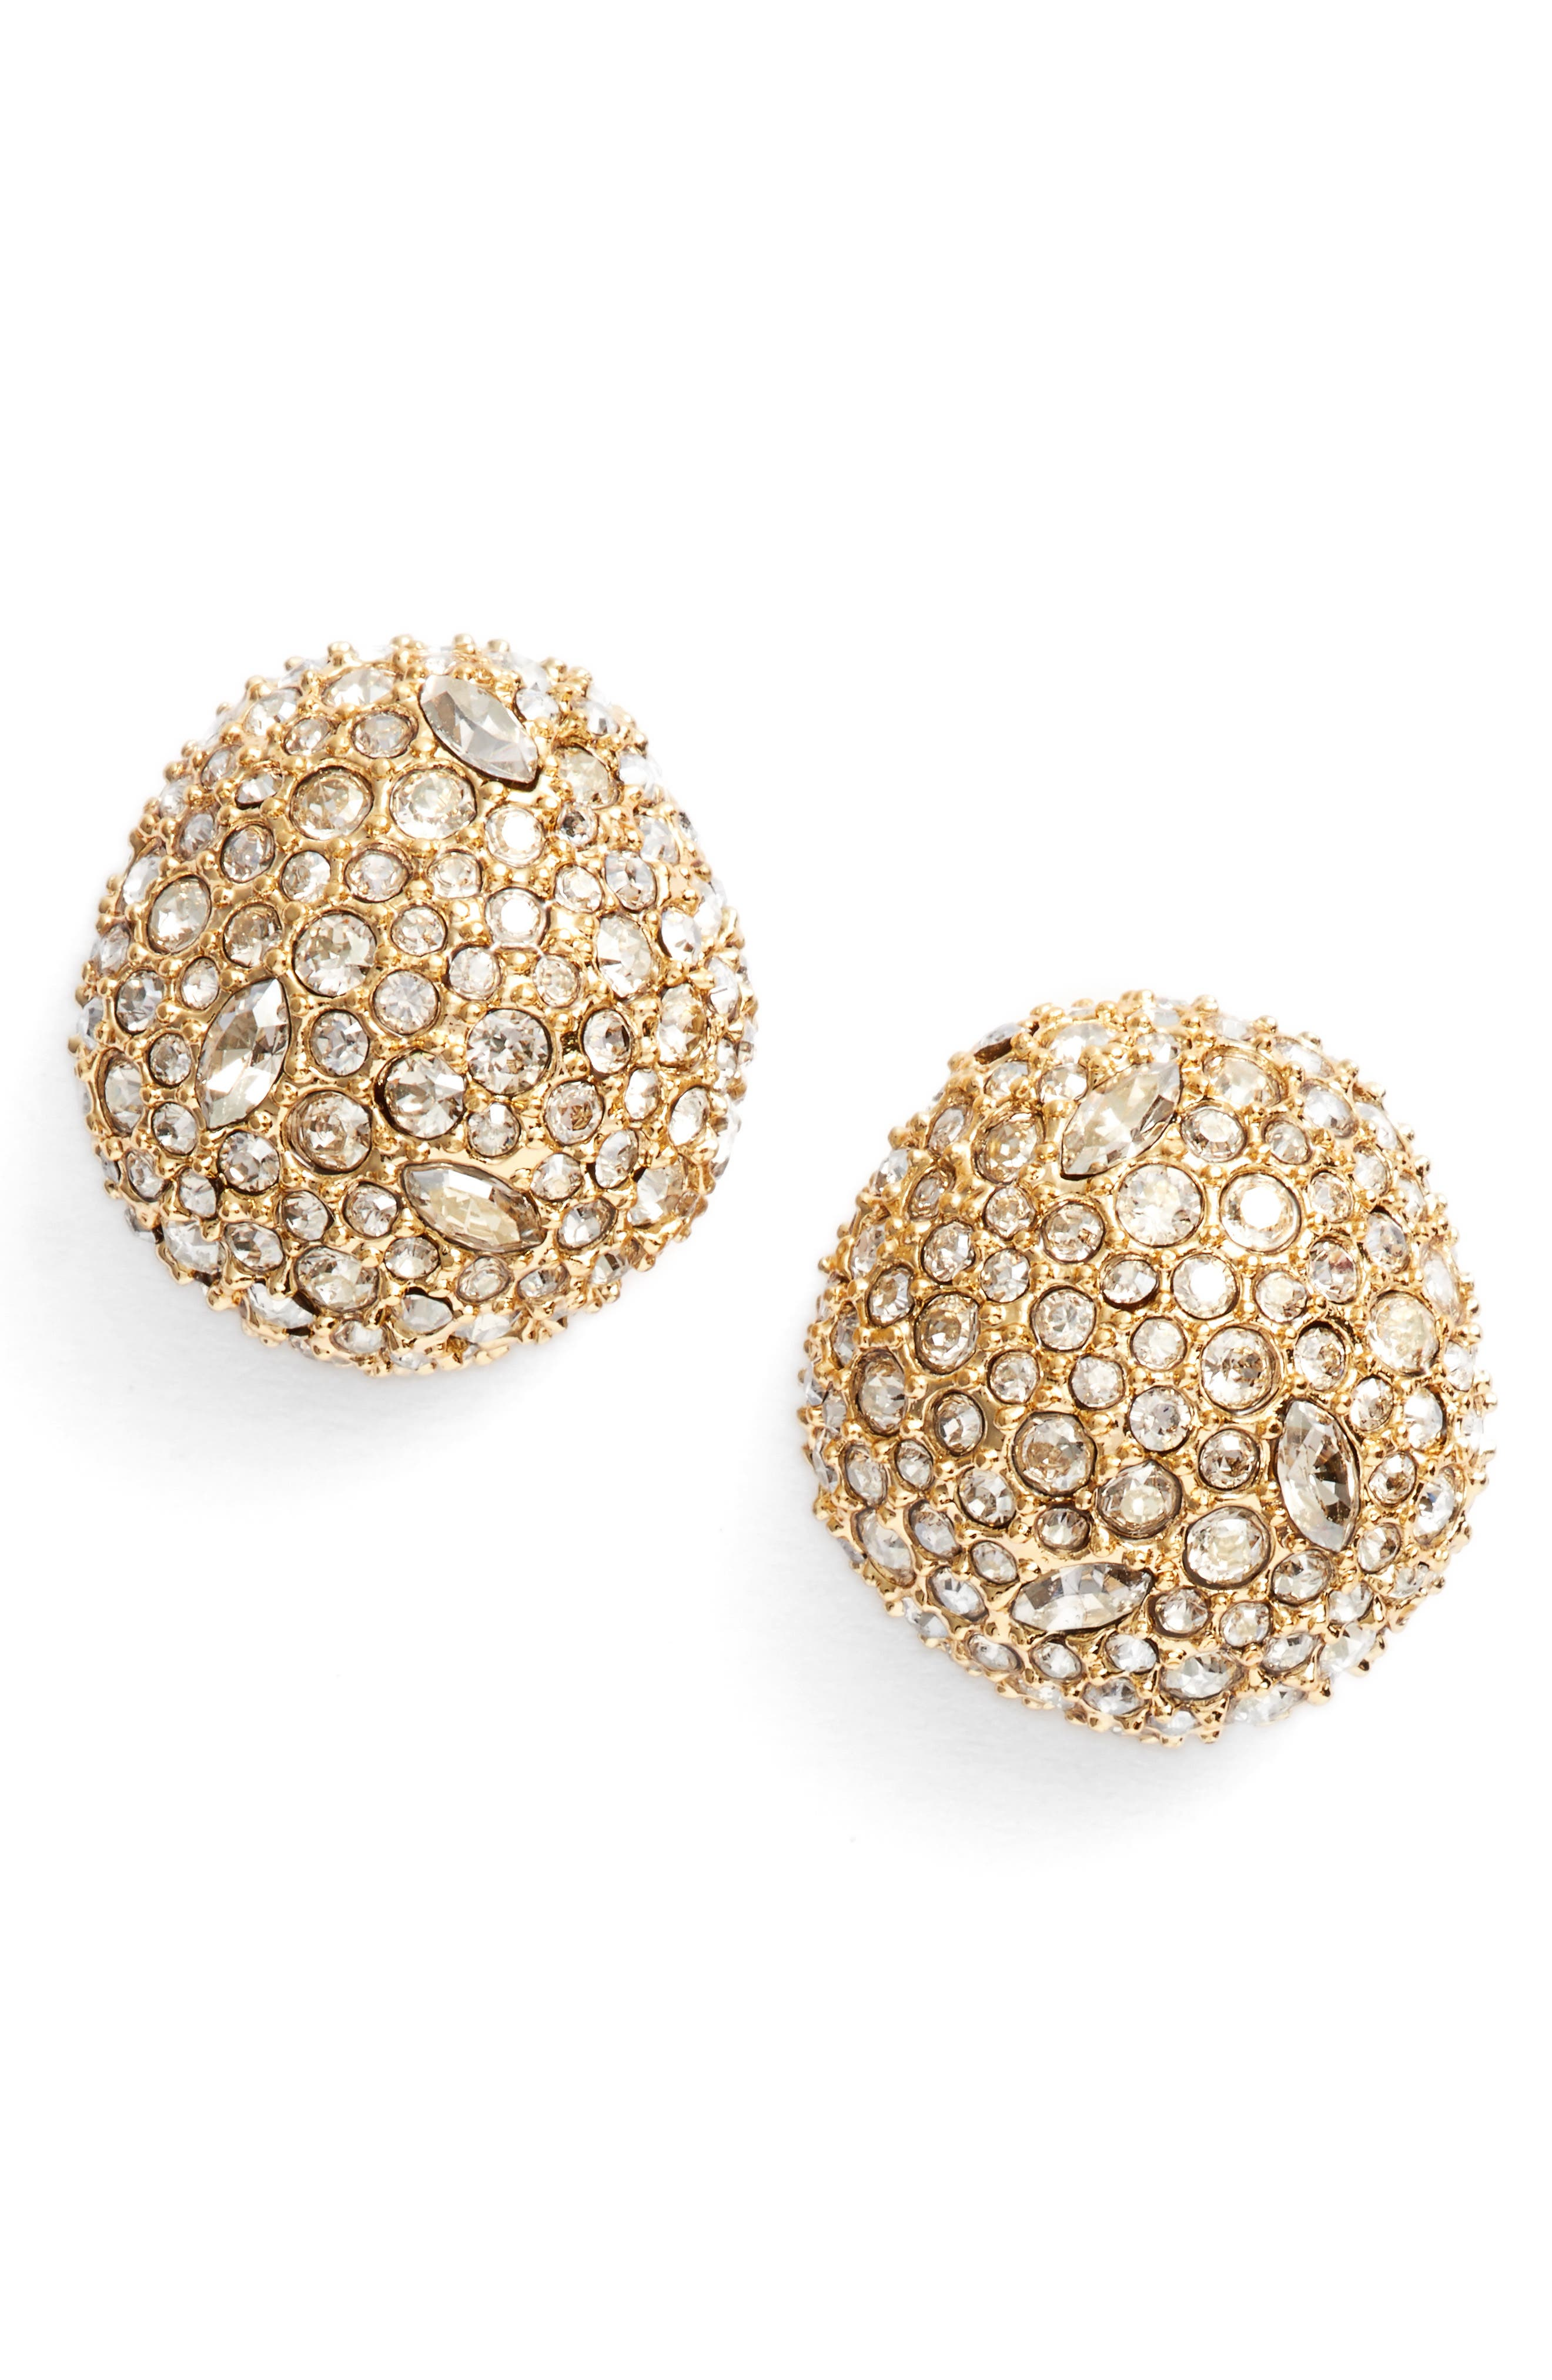 Crystal Encrusted Stud Earrings,                         Main,                         color, Gold